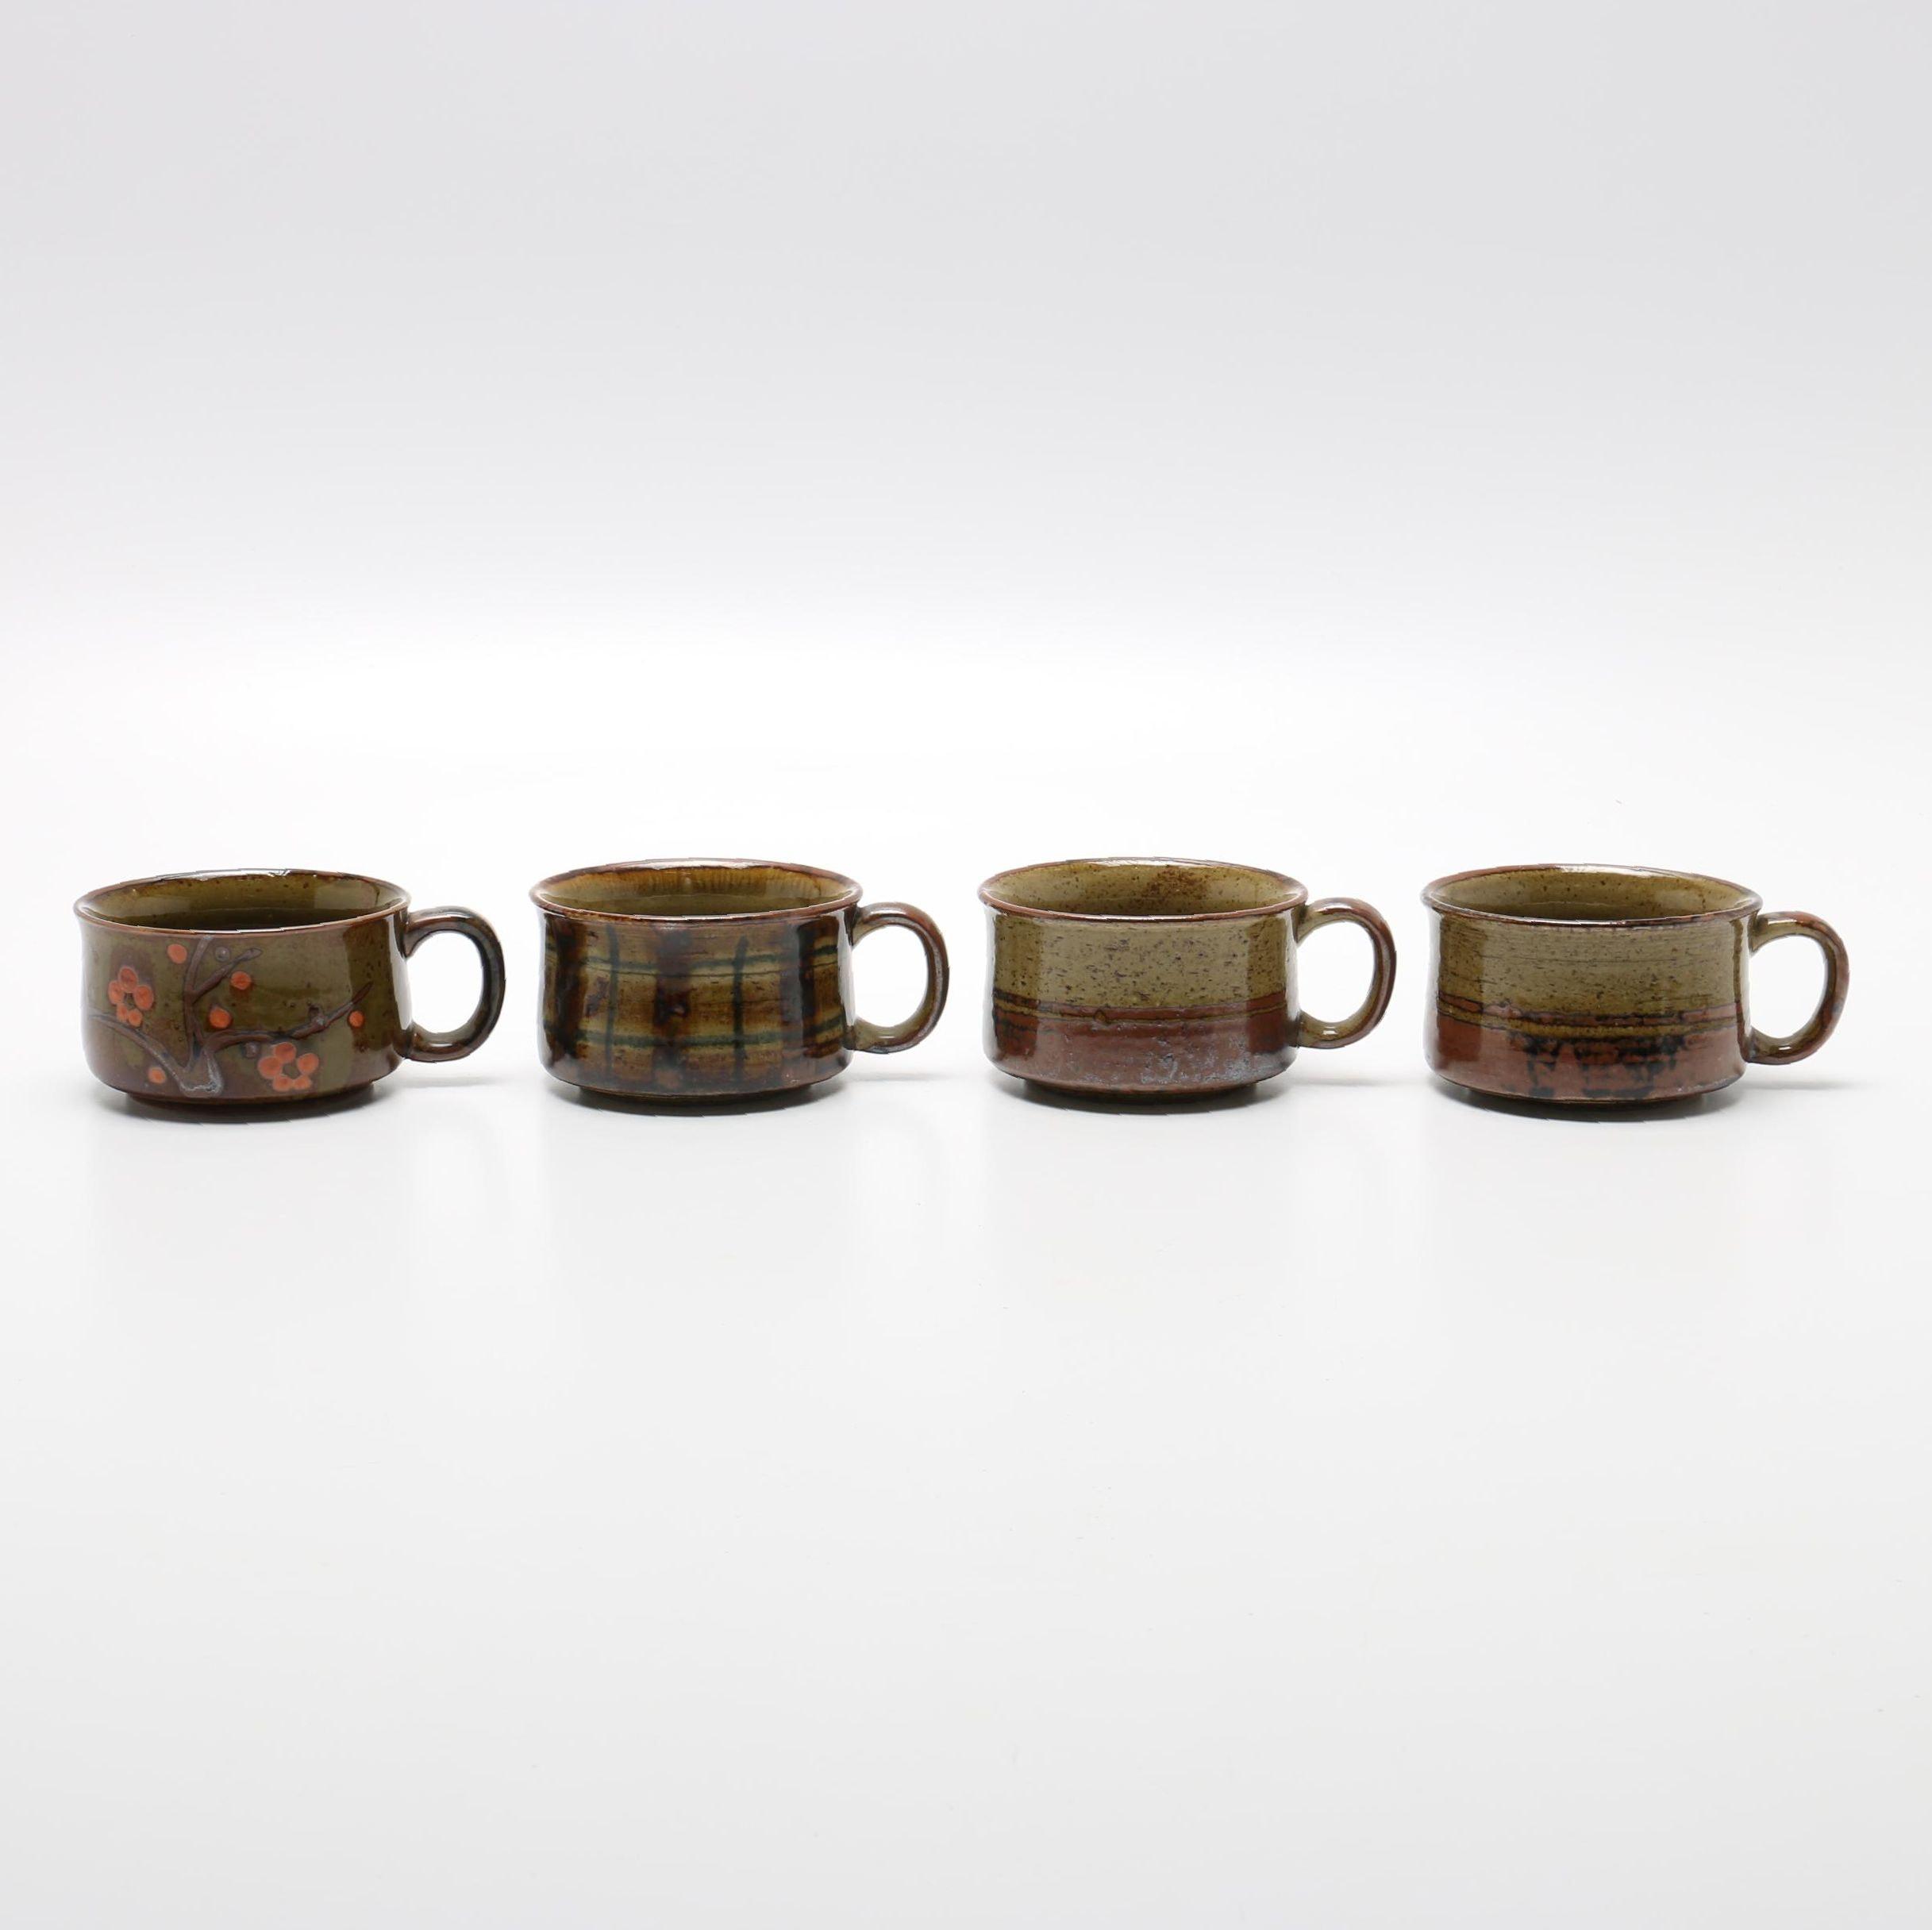 Handmade Brown Stoneware Soup Mugs